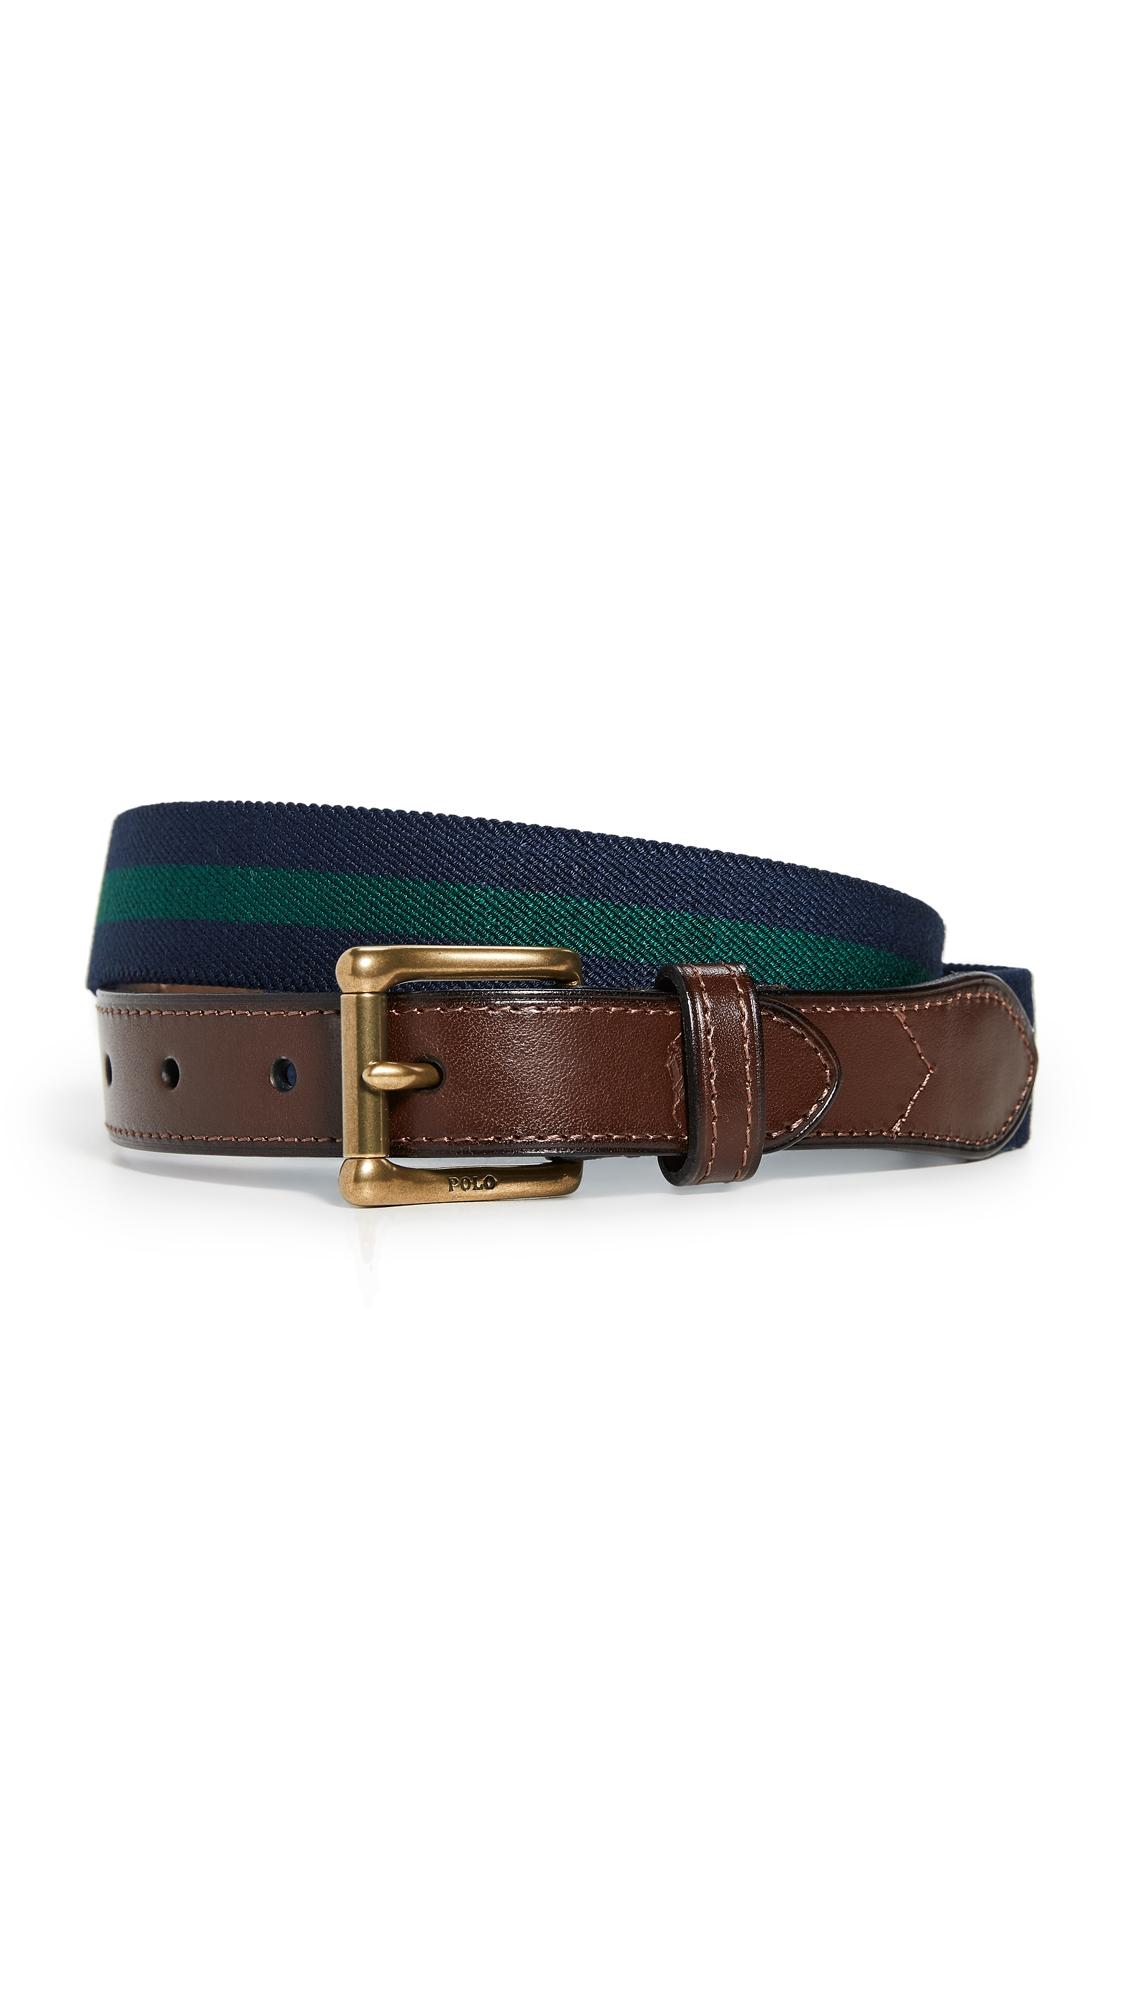 Polo Ralph Lauren Striped Casual Elastic Webbing Belt In Navy/forest Green